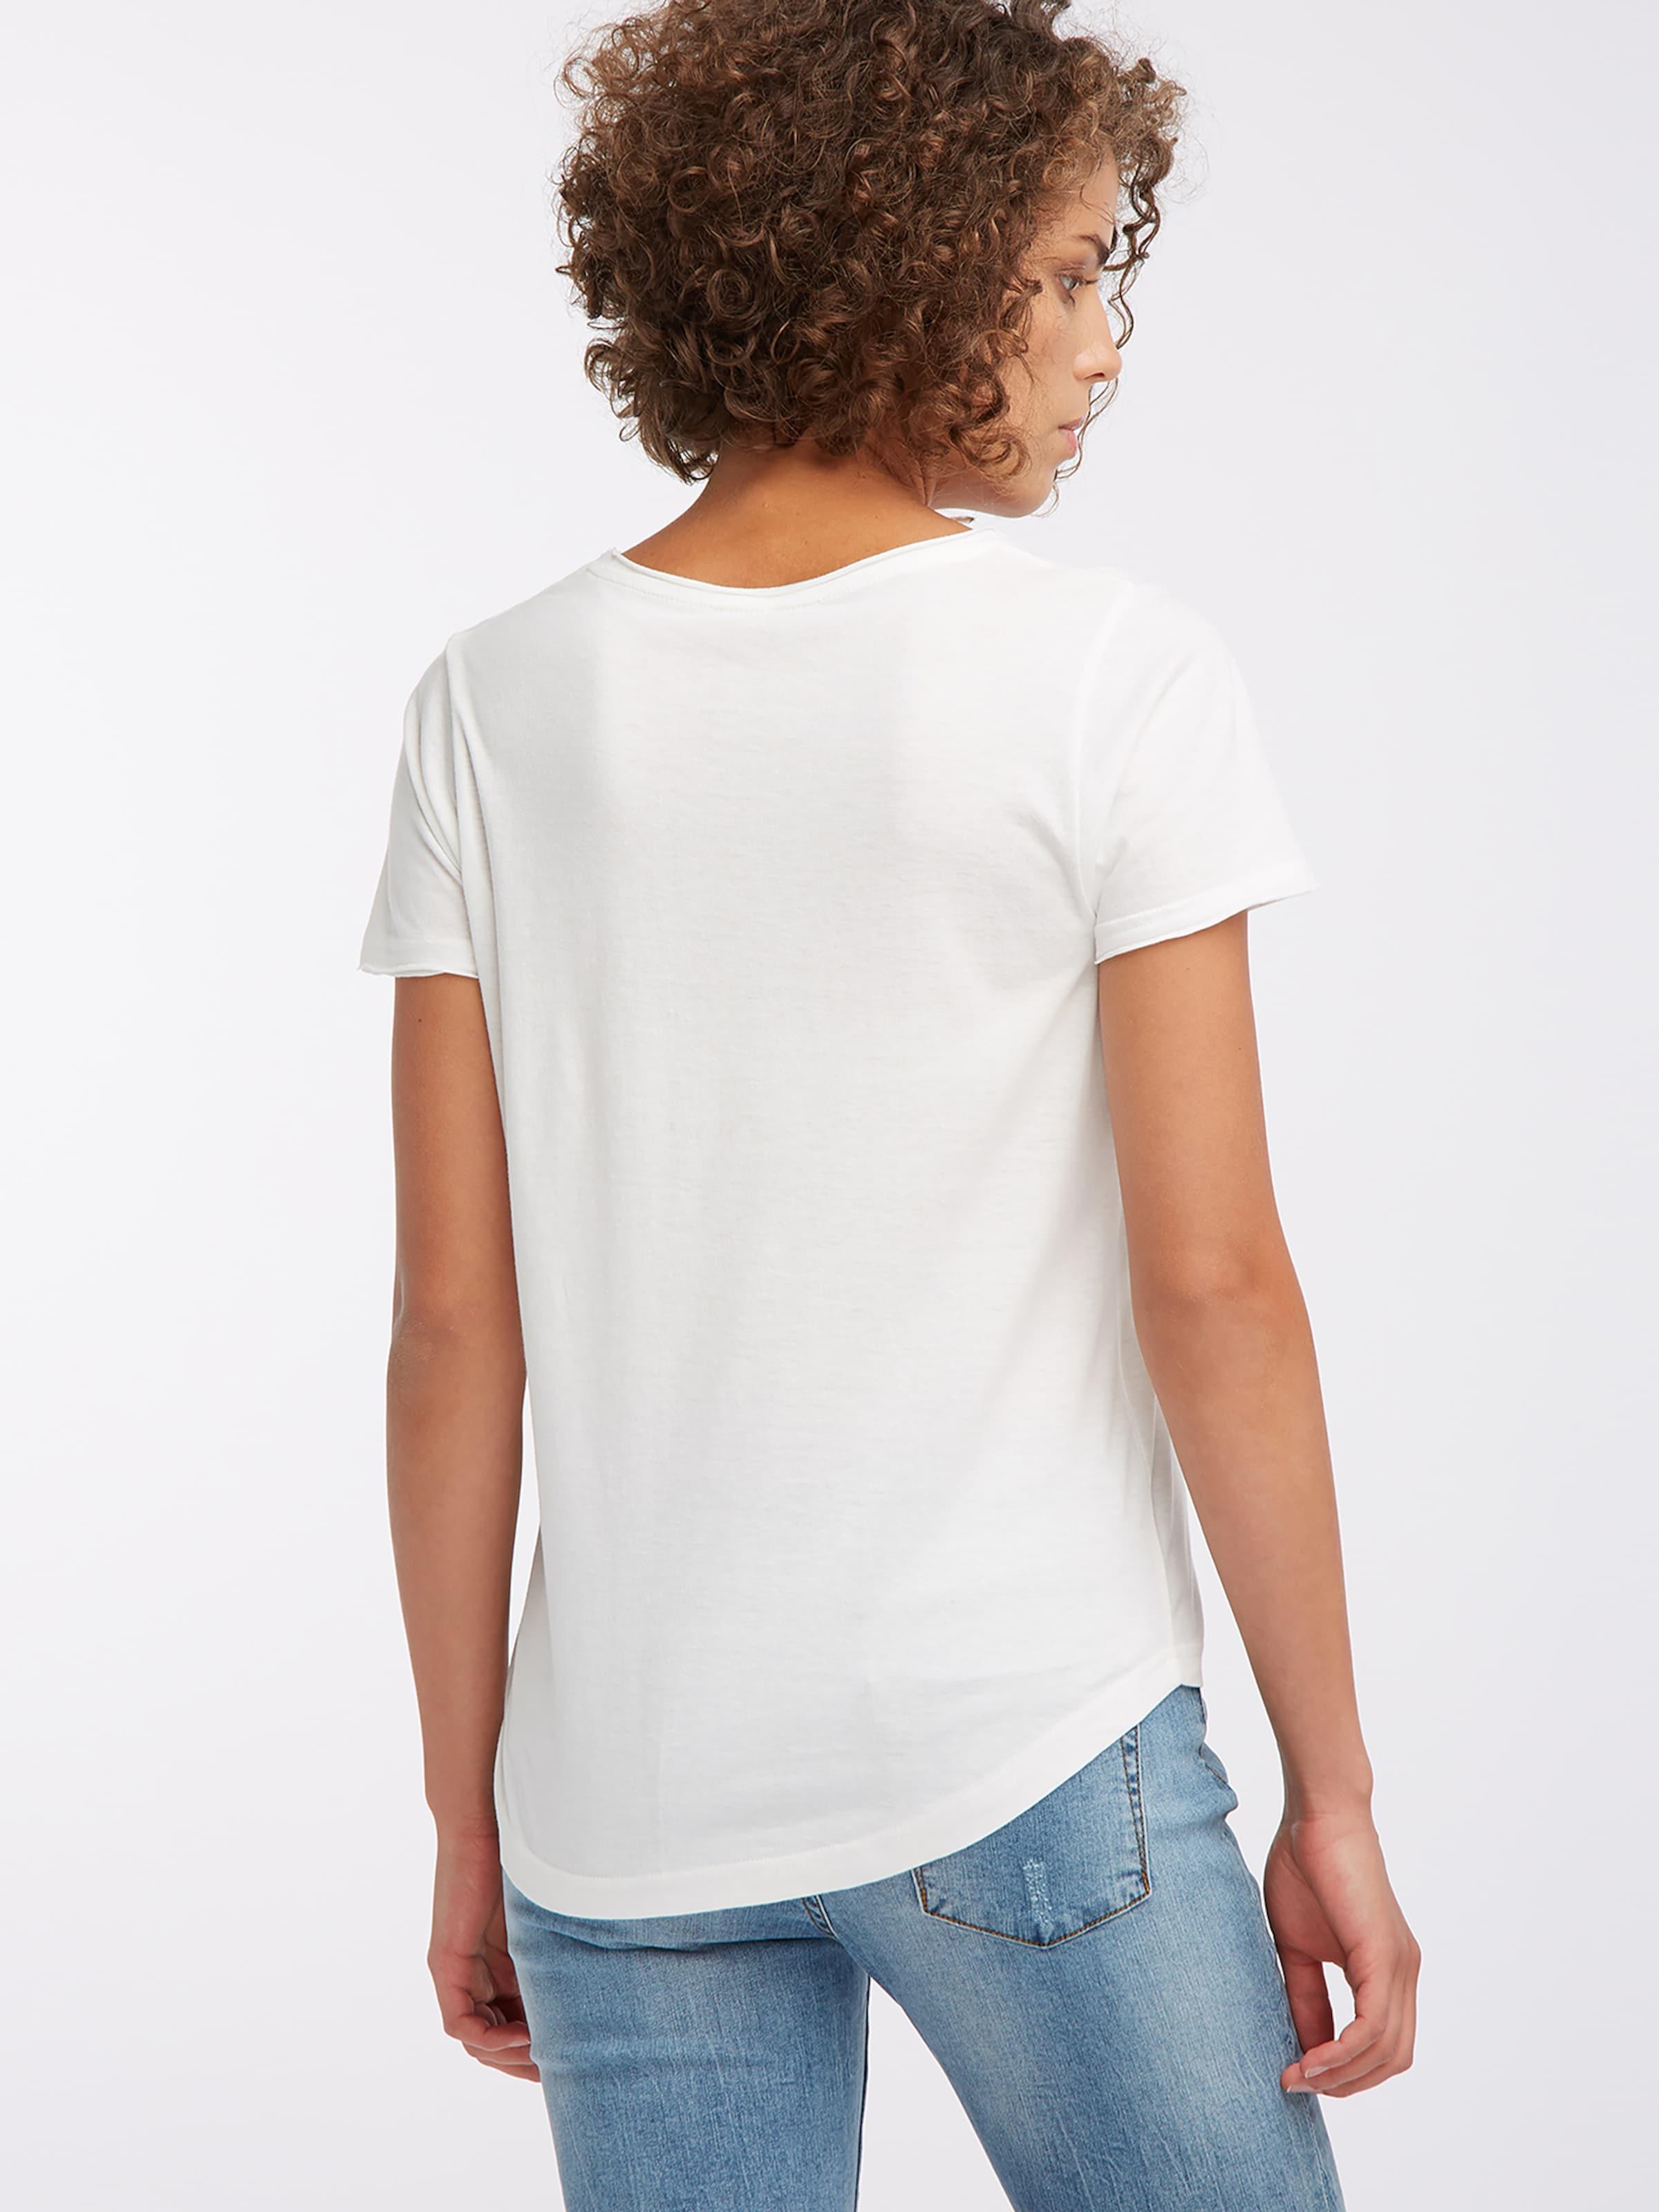 T Fashion shirt Nyc Broadway 'orah' En RoséBlanc 3c5lF1JuTK